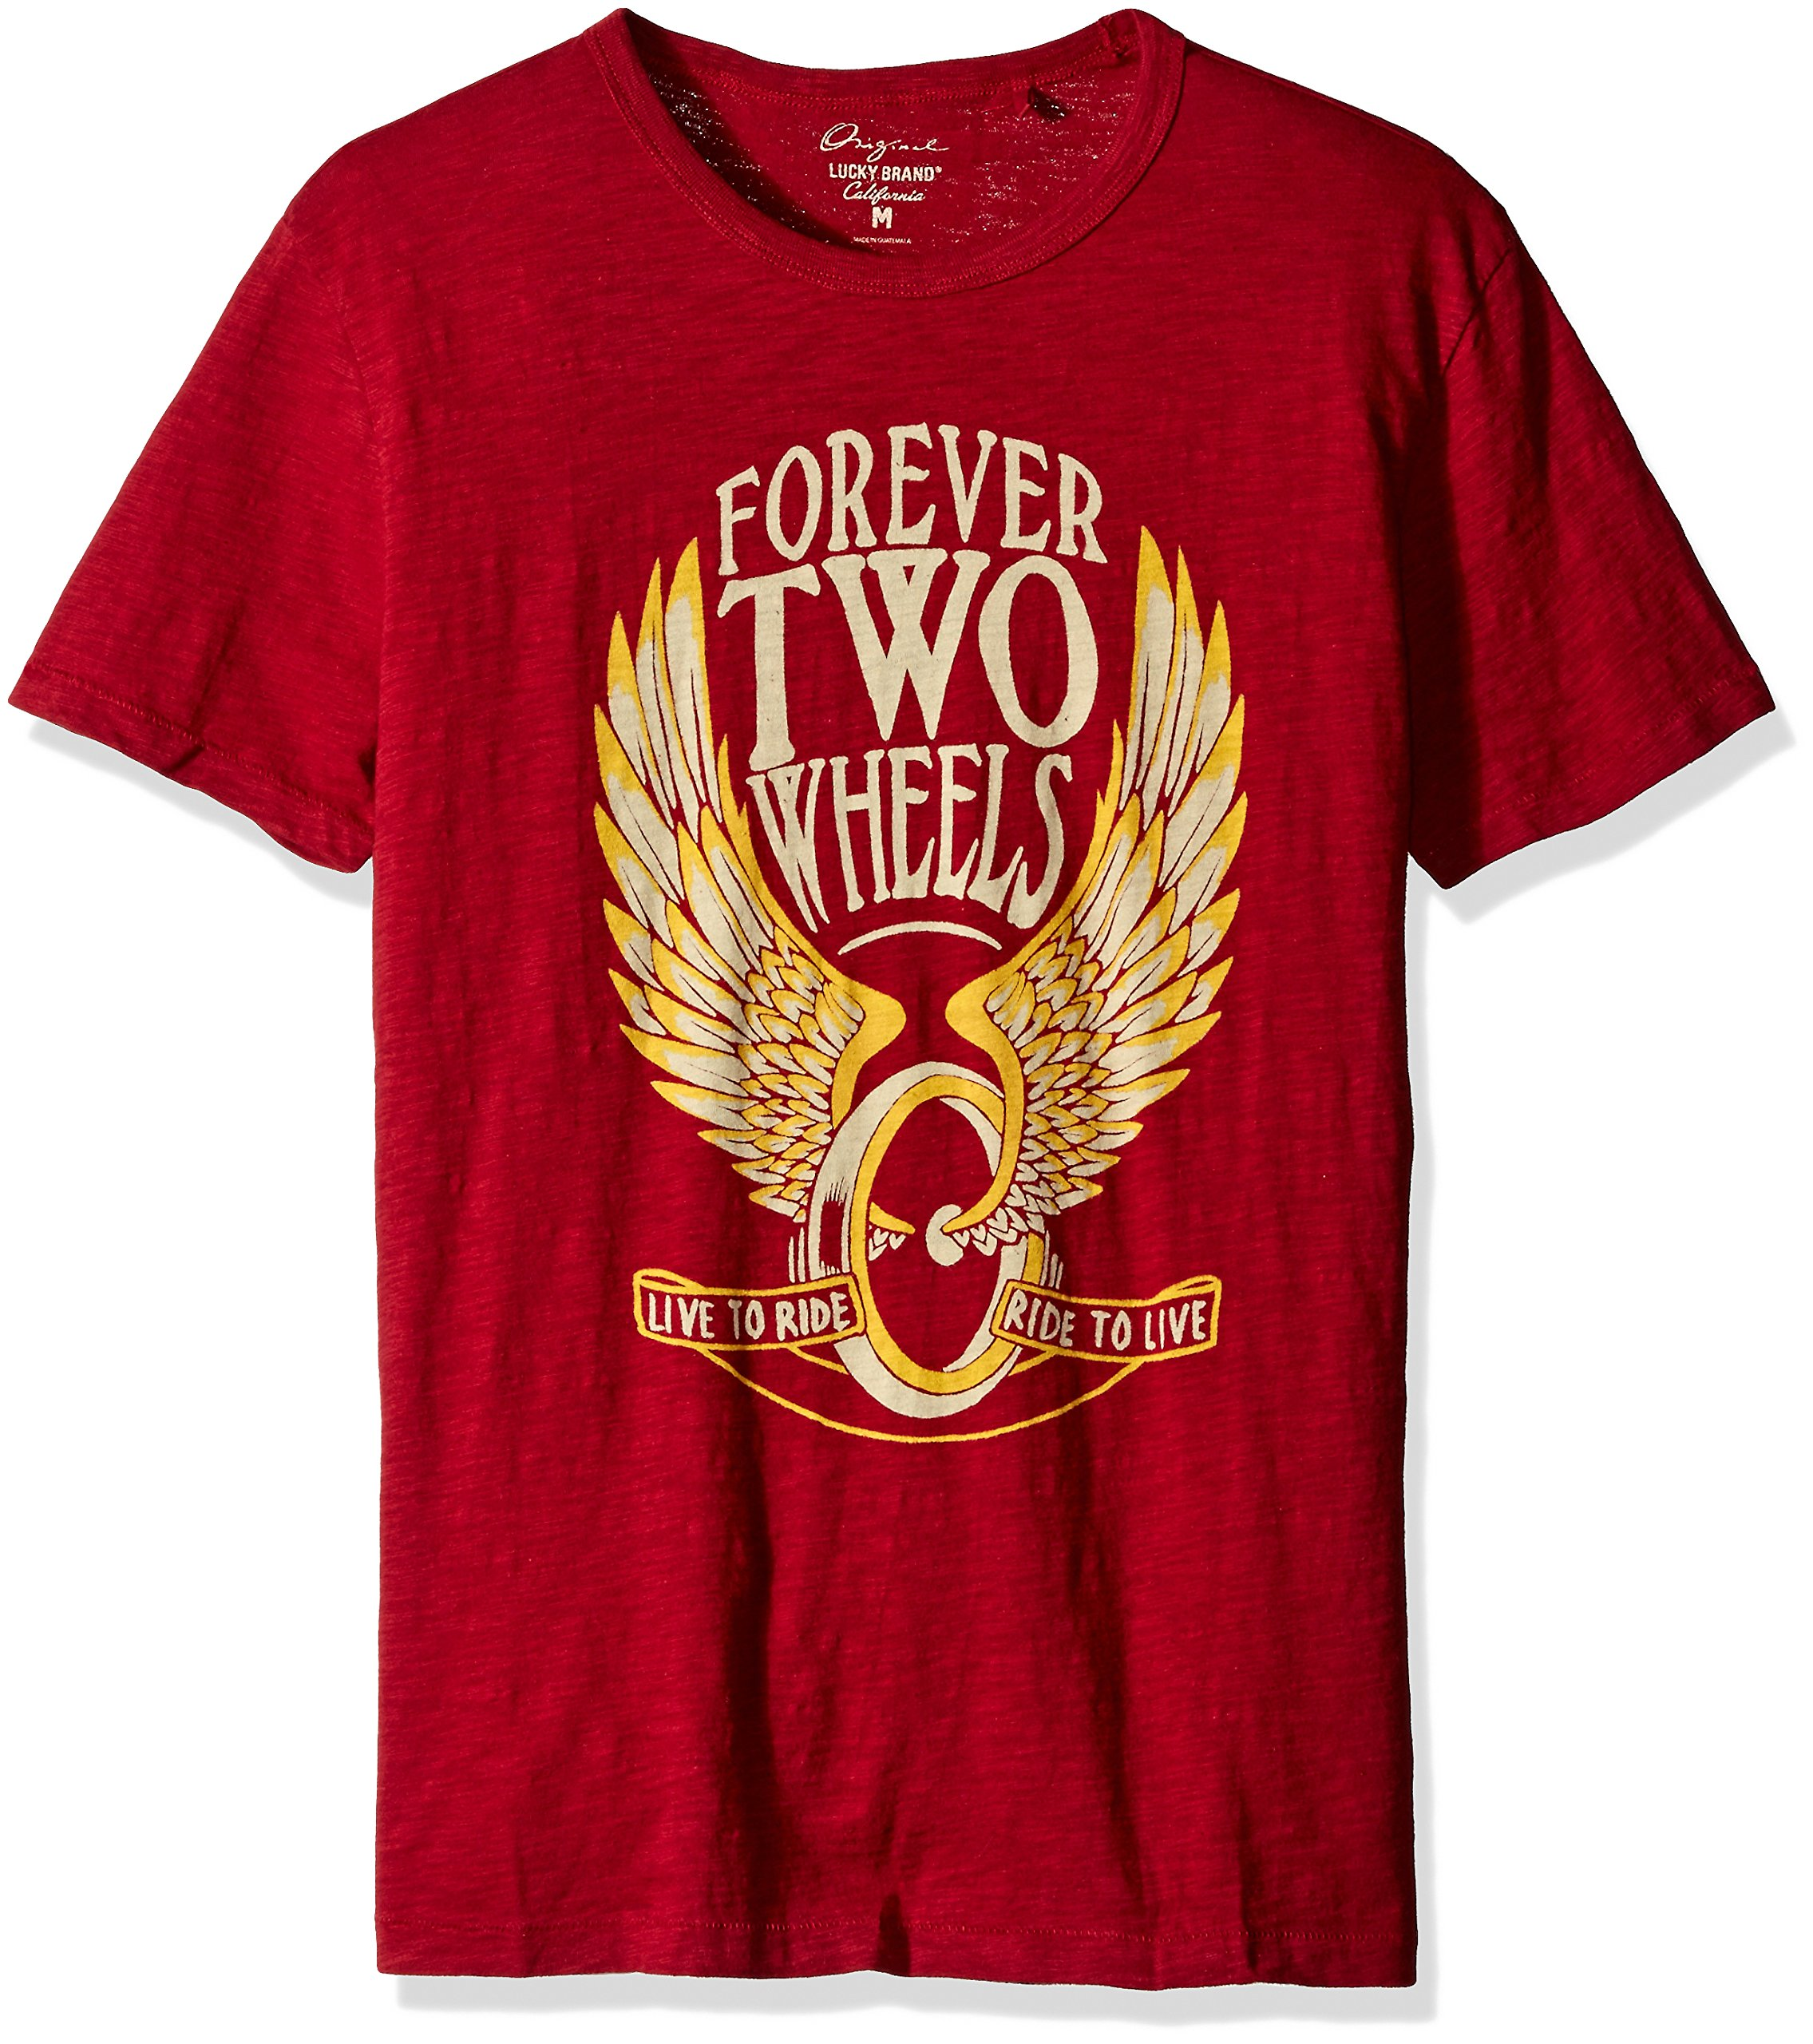 Lucky Brand Men's Forever Two Wheels Graphic Tee, Biking Red, Medium